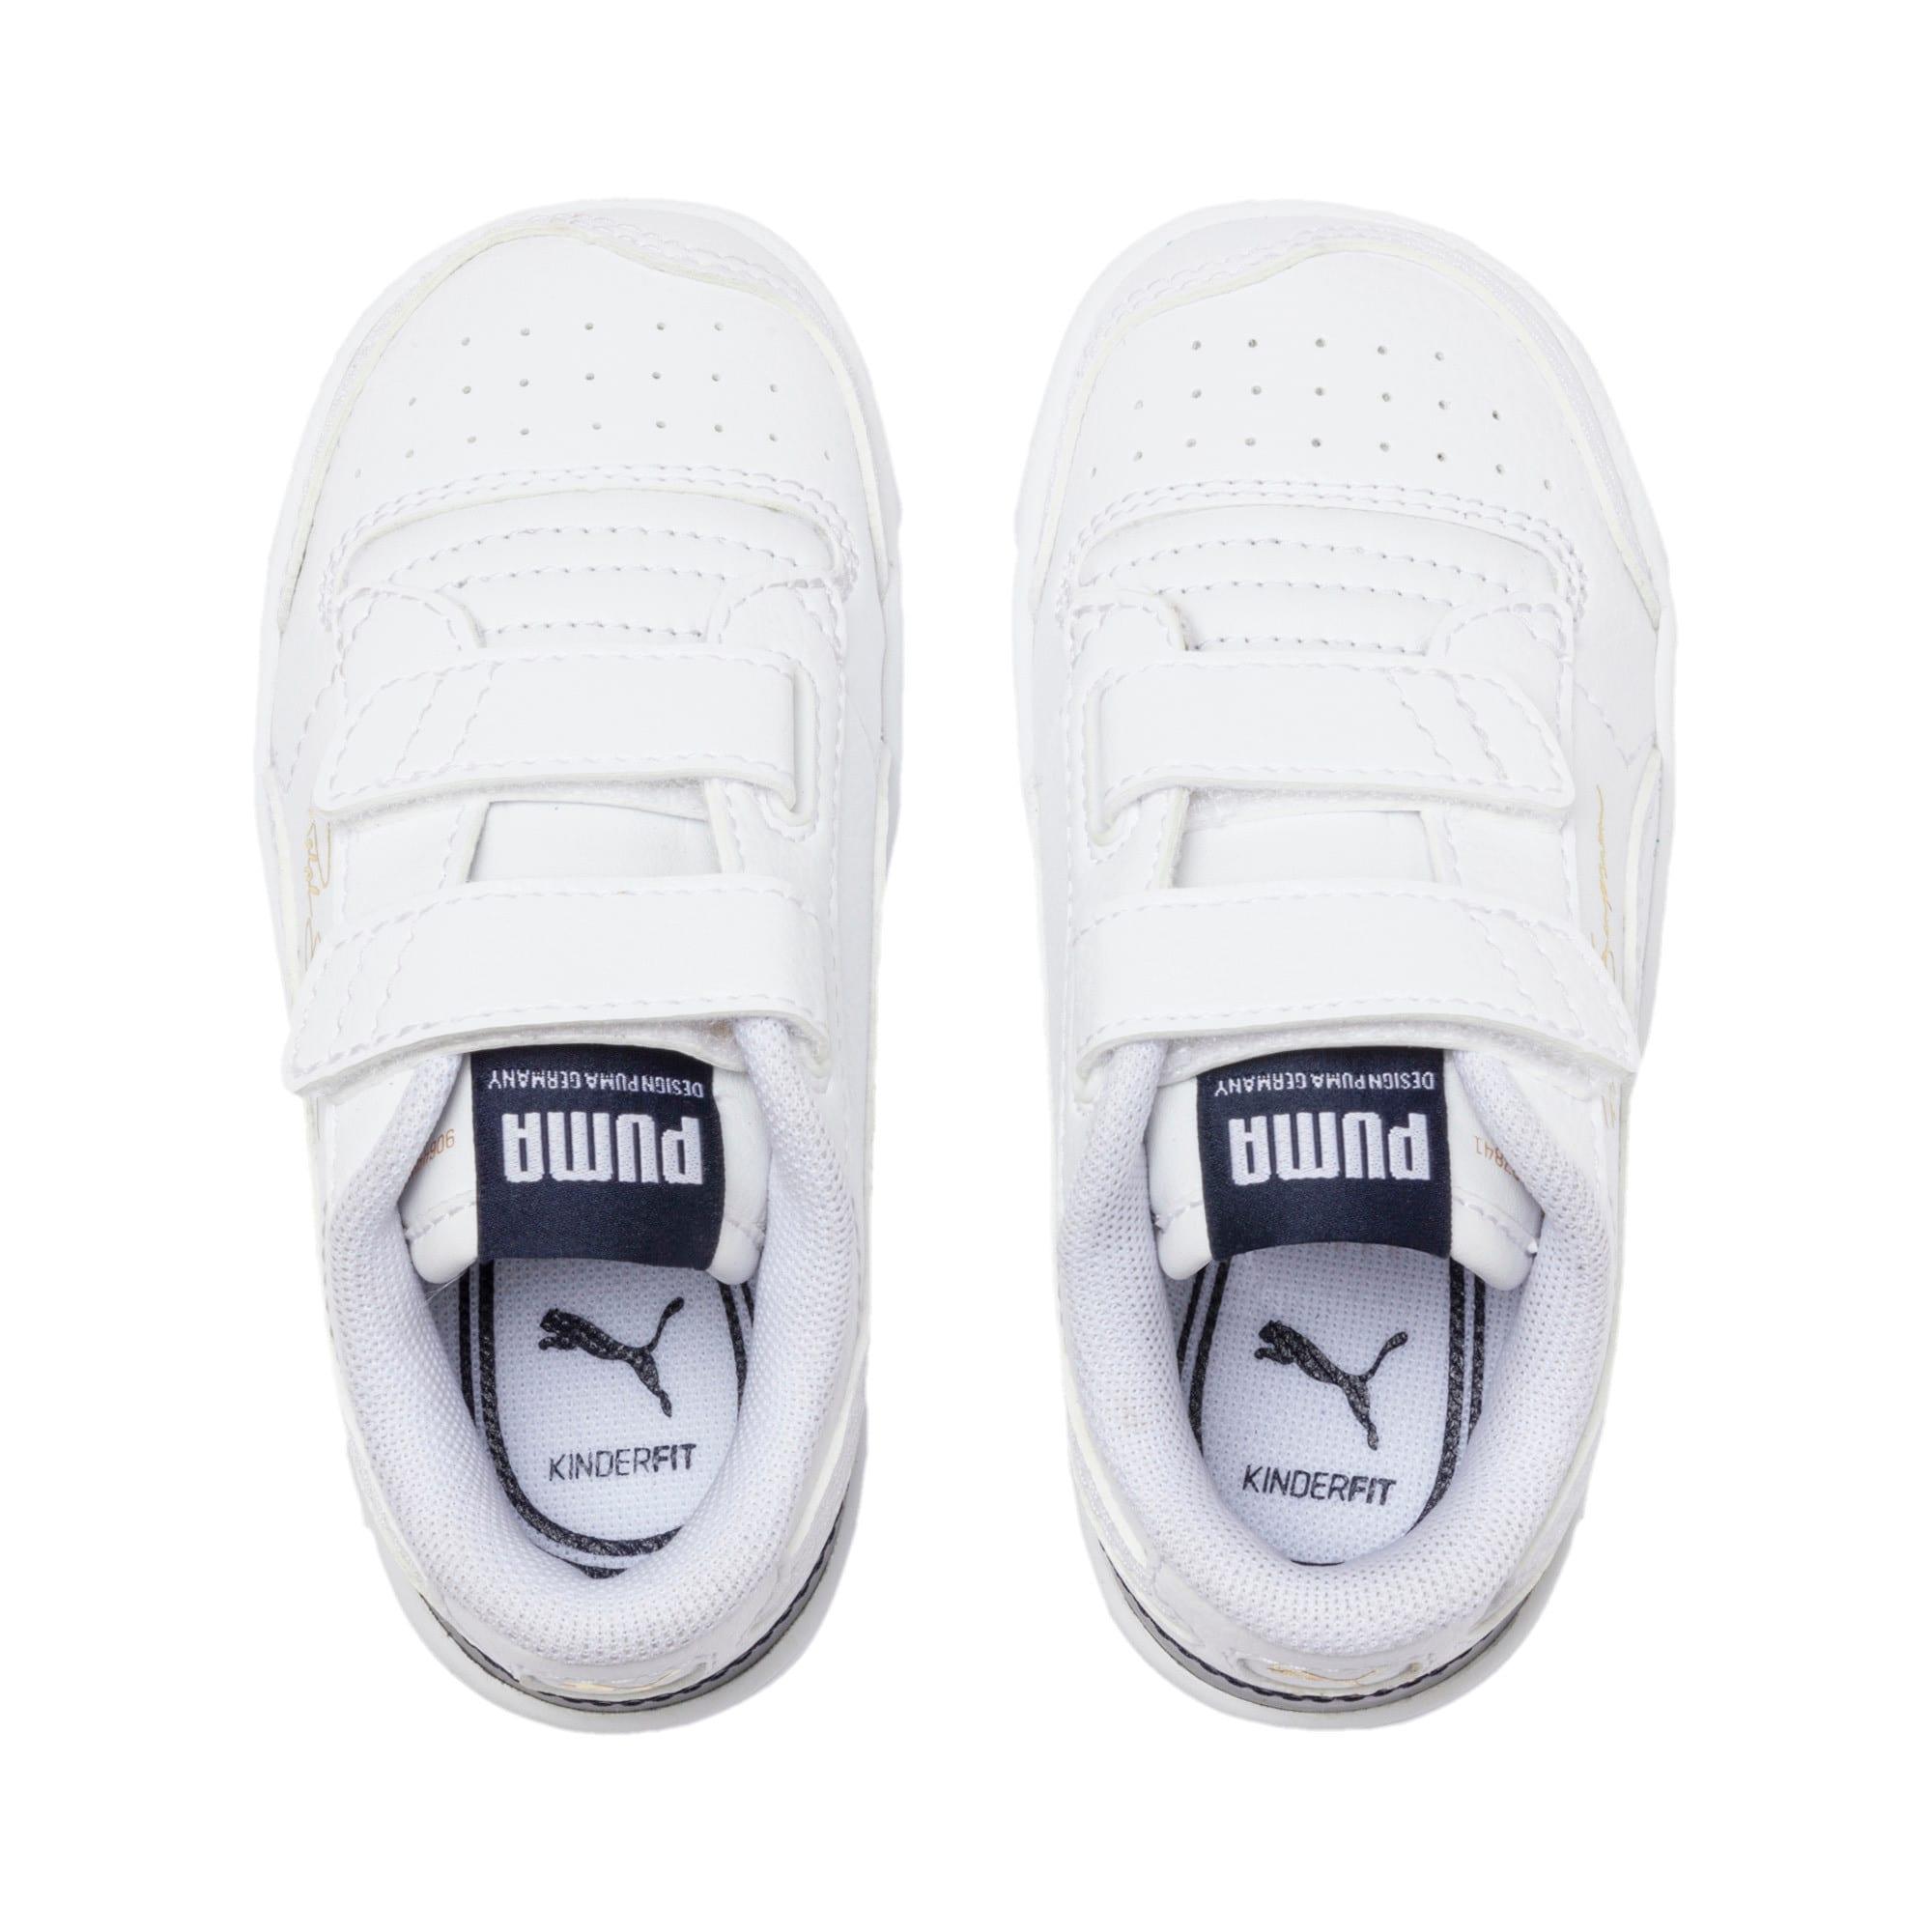 Thumbnail 6 of Ralph Sampson Low AC Toddler Shoes, White-Peacoat-White, medium